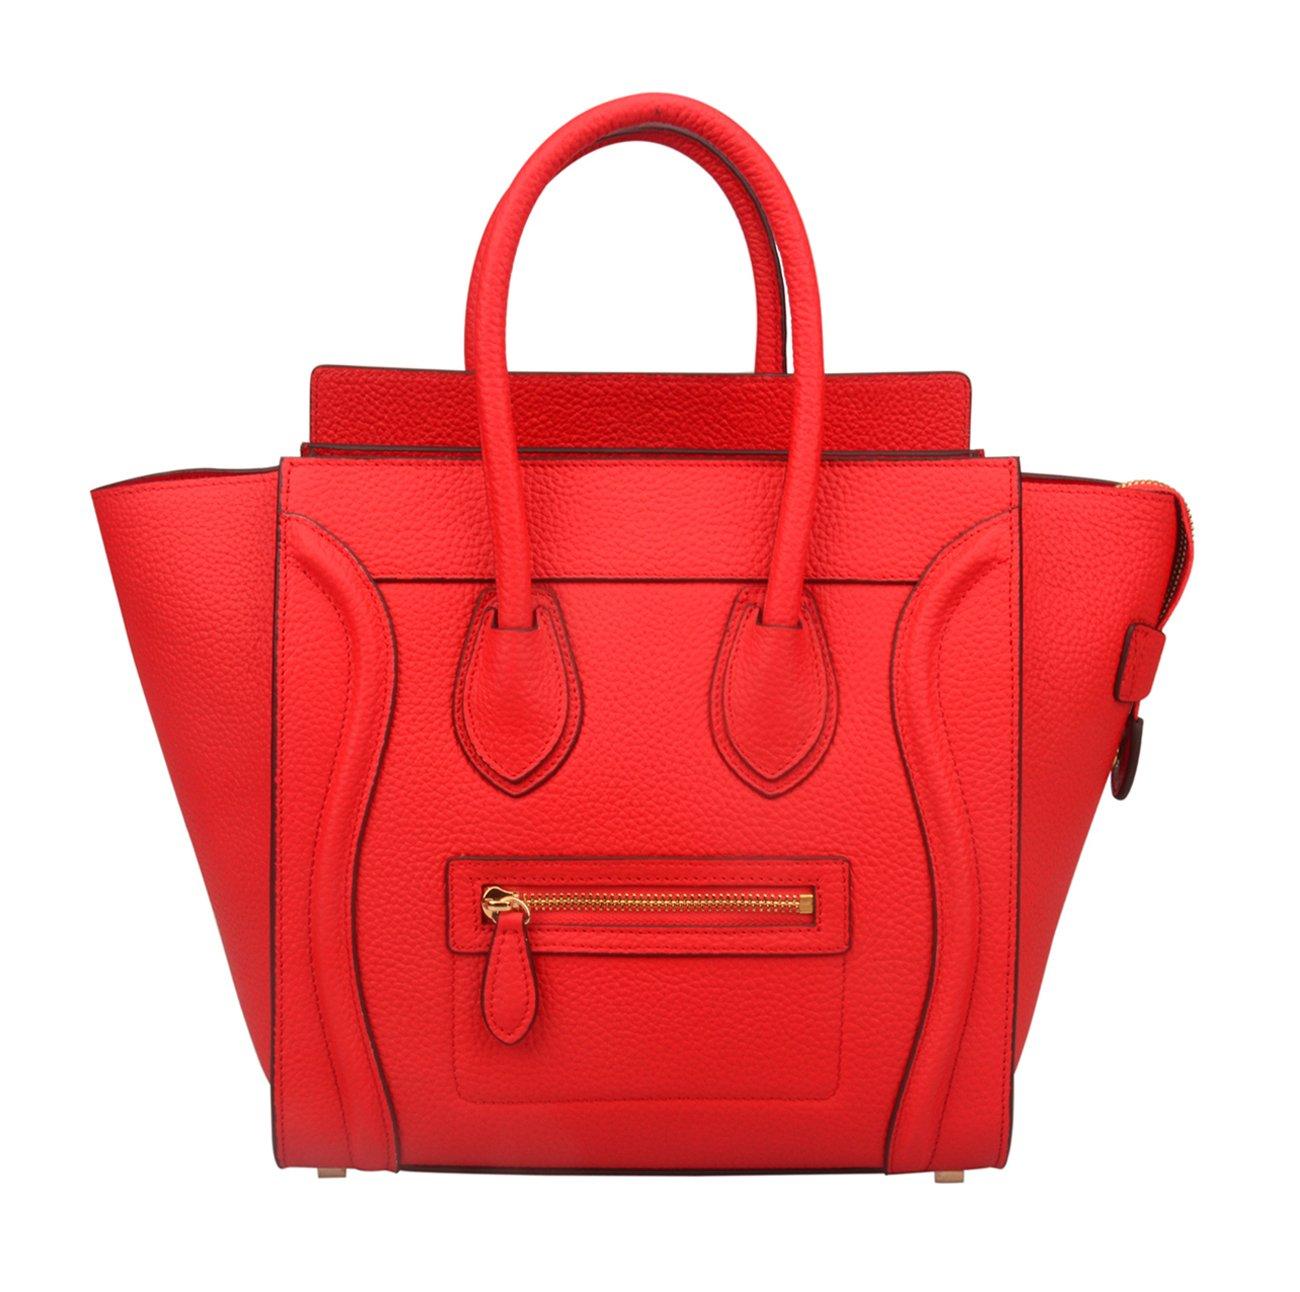 Ainifeel Women's Genuine Leather Smile Top Handle Handbag Purse (Medium, Red)